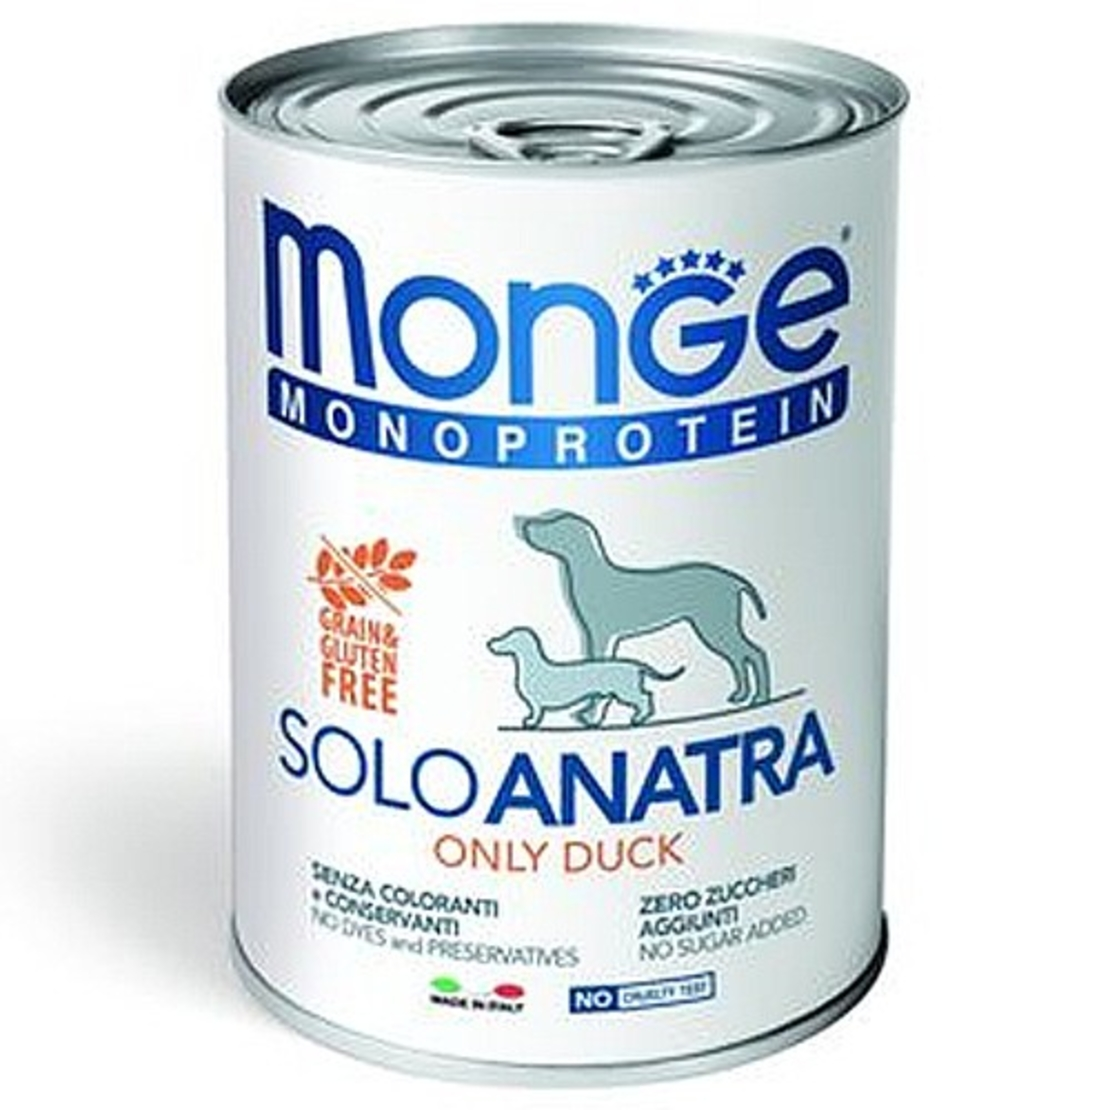 MONGE מונג' מזון רטוב לכלבים מונו פרוטאין בטעם ברווז 400 גרם